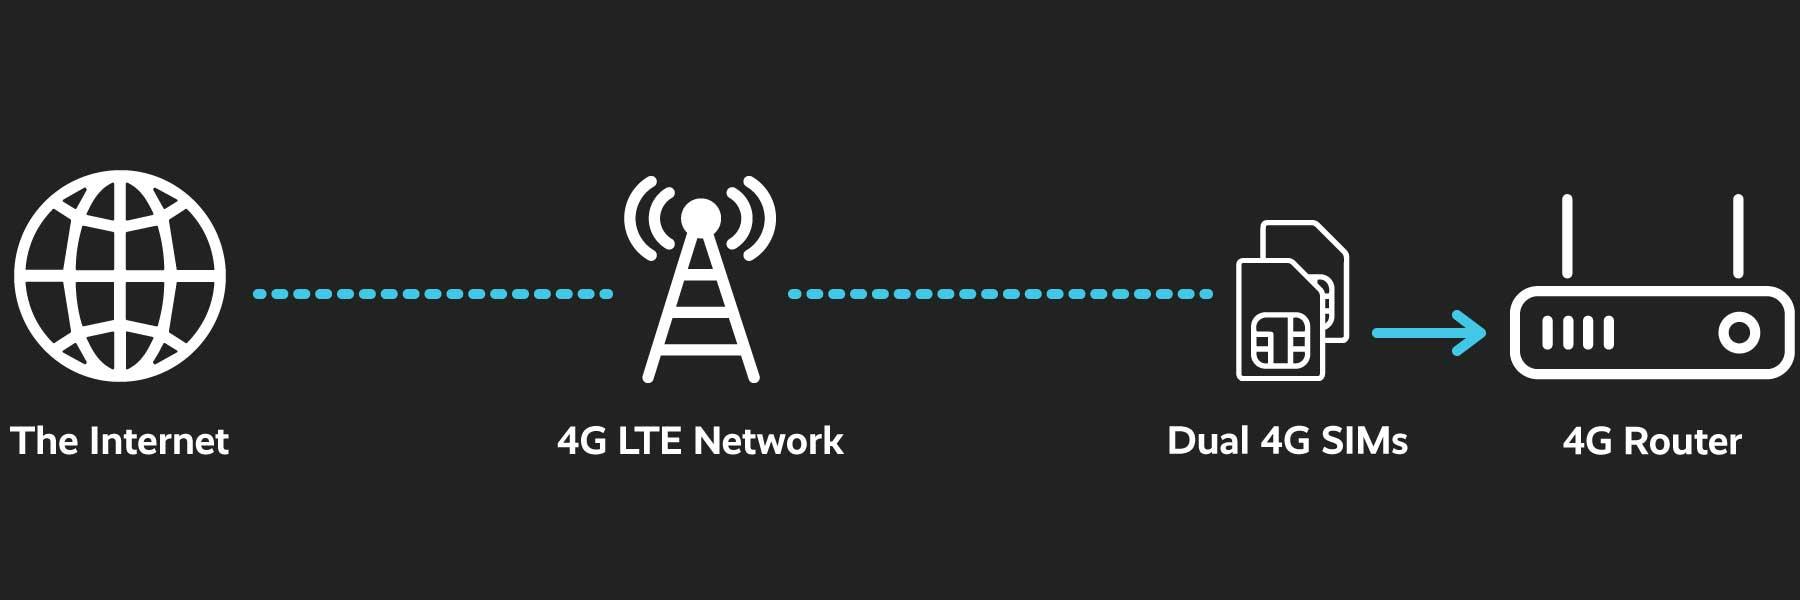 4G broadband diagram